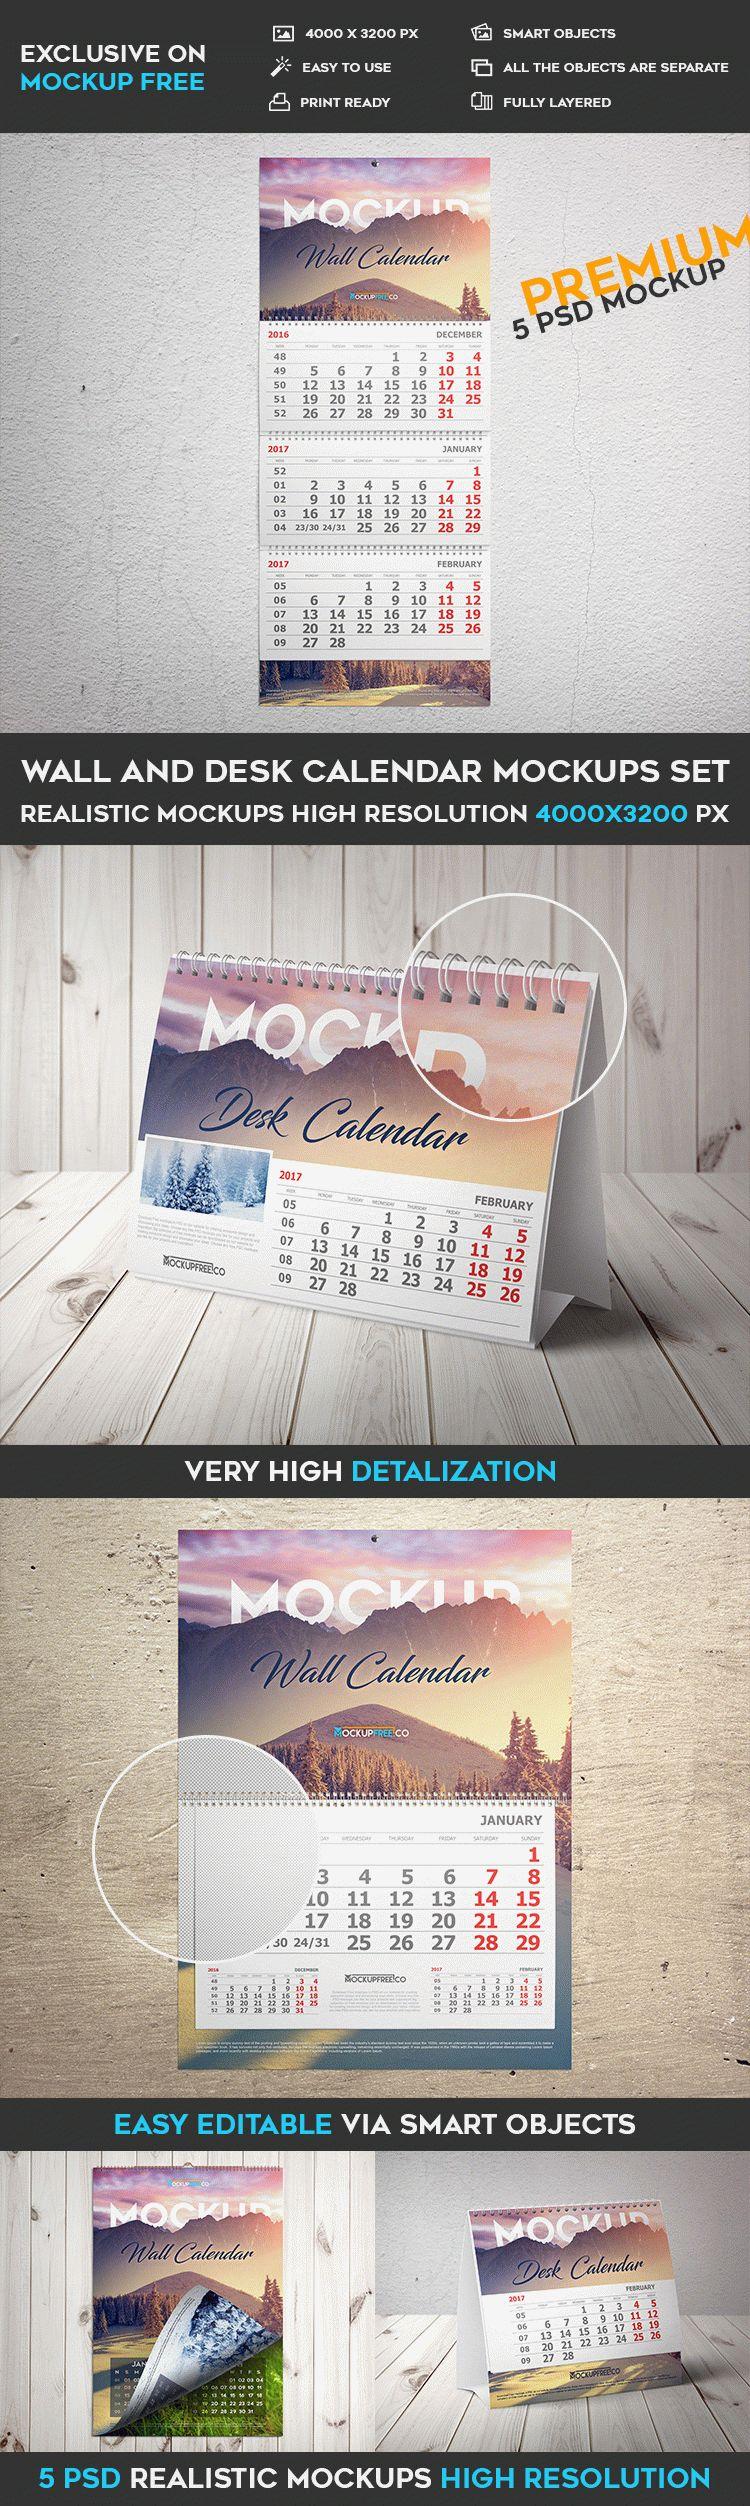 preview_premium_wall-and-desk-calendar-mockups-set-5-premium-psd-mockups